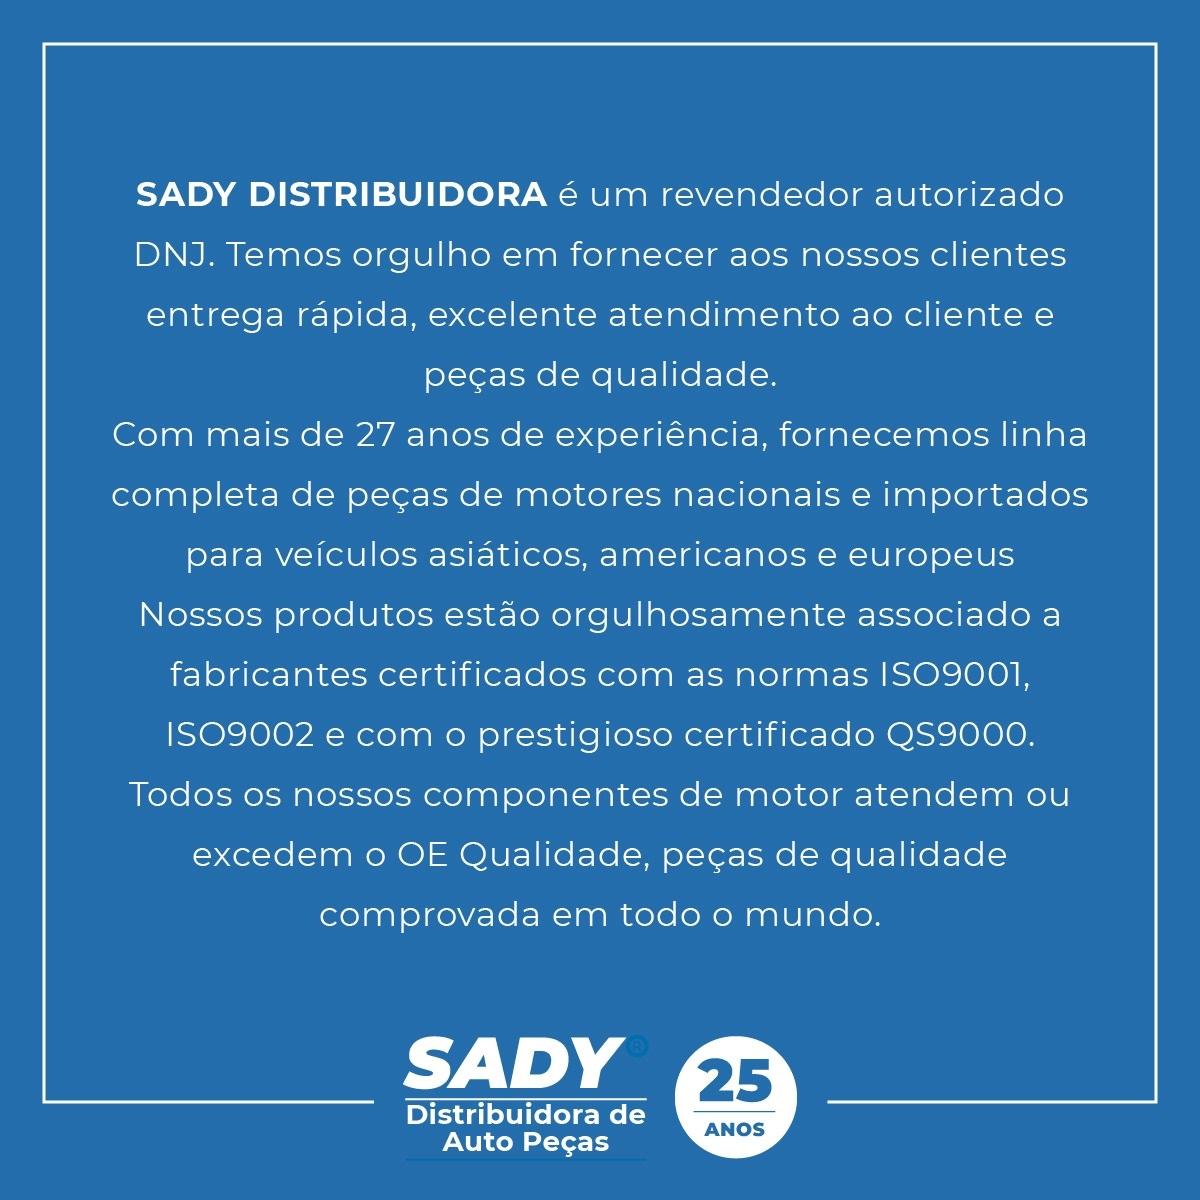 BOMBA DE OLEO DO MOTOR MERCEDES 4.2 E420